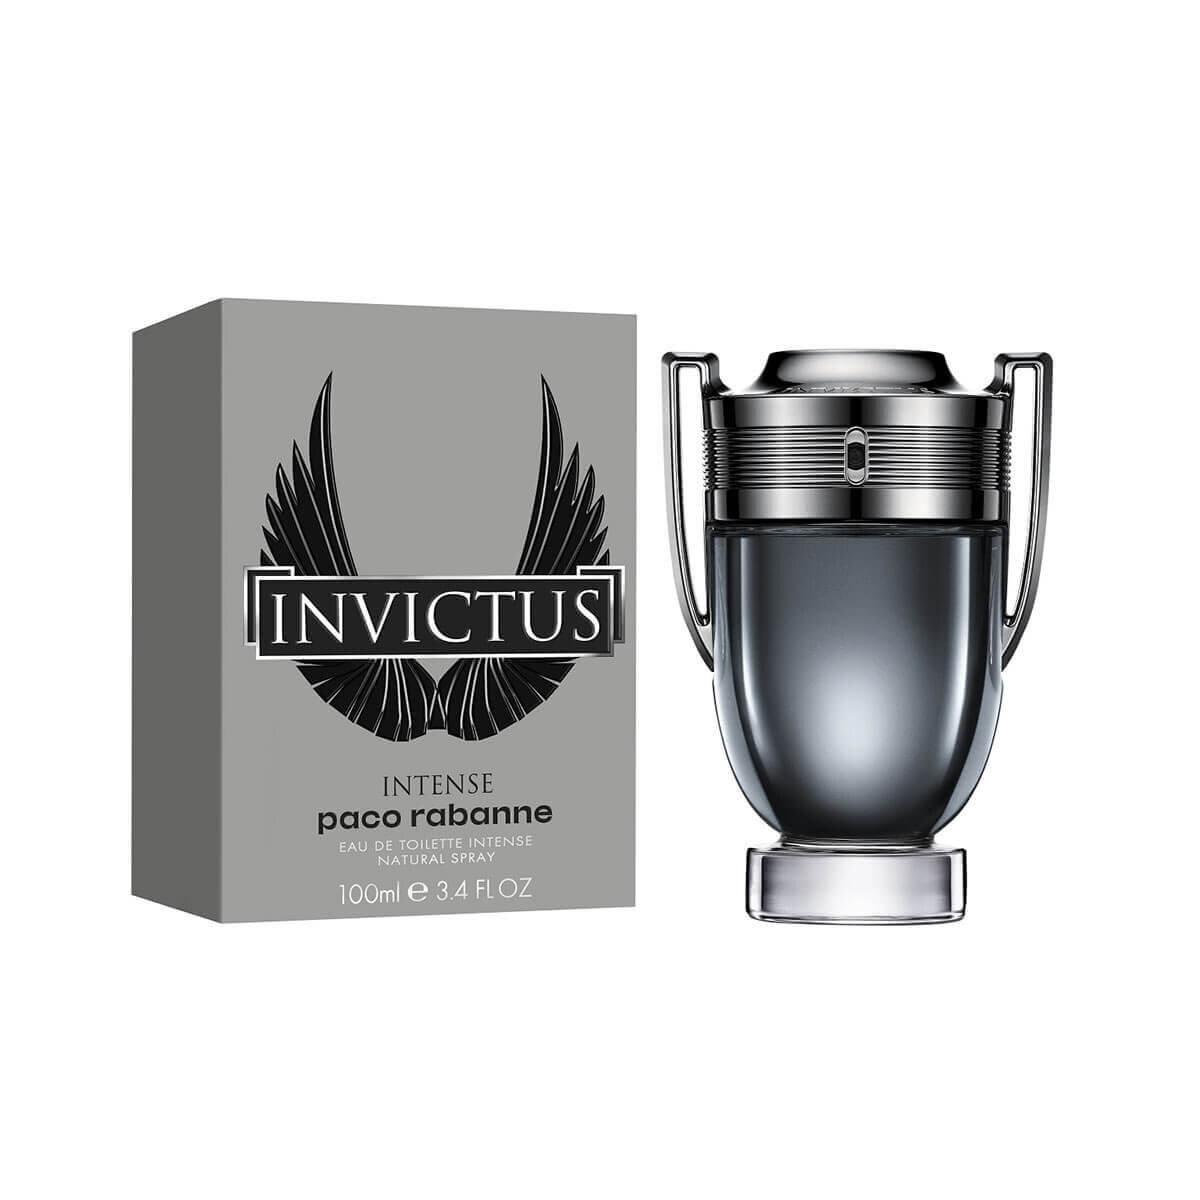 Invictus Intense Erkek Edt 100 ml